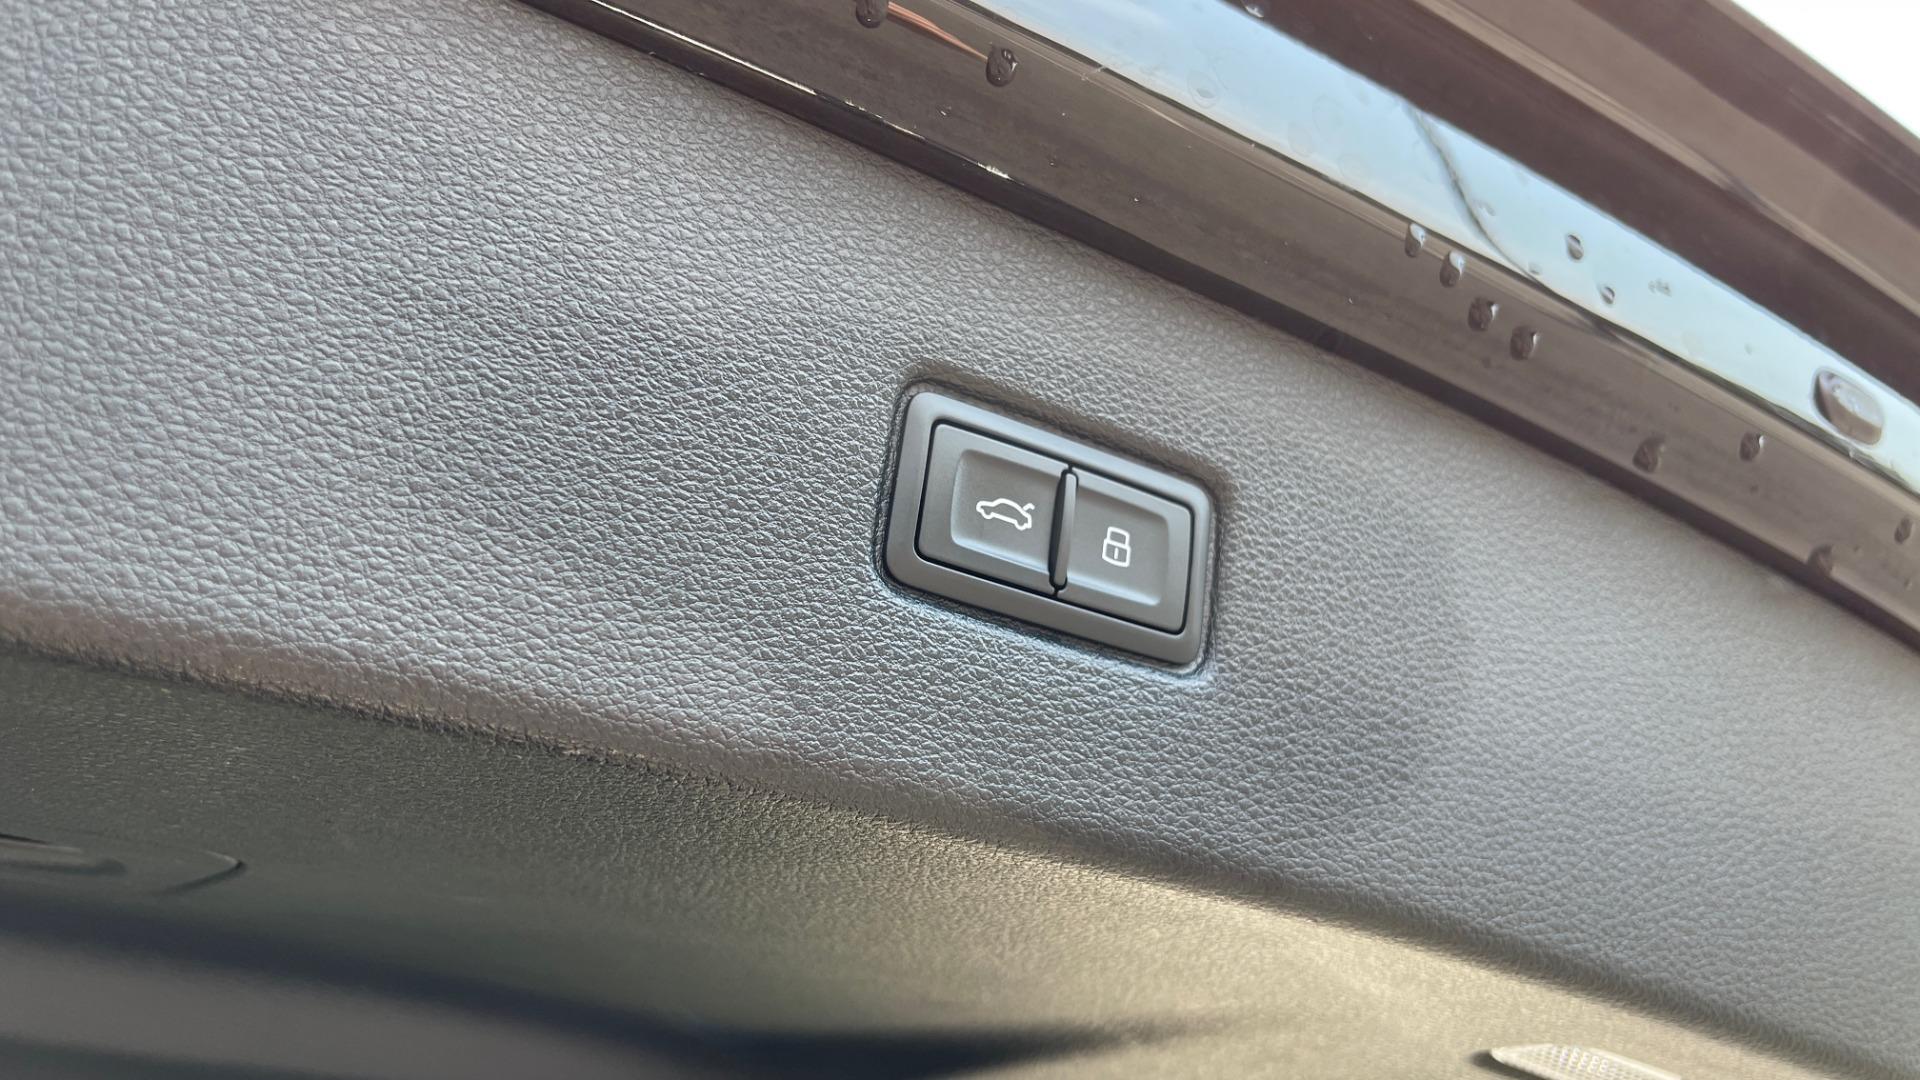 Used 2018 Audi Q7 PRESTIGE TIPTRONIC / NAV / SUNROOF / ADAPTIVE PKG / DRVR ASST / CLD WTHR /  for sale $49,995 at Formula Imports in Charlotte NC 28227 17